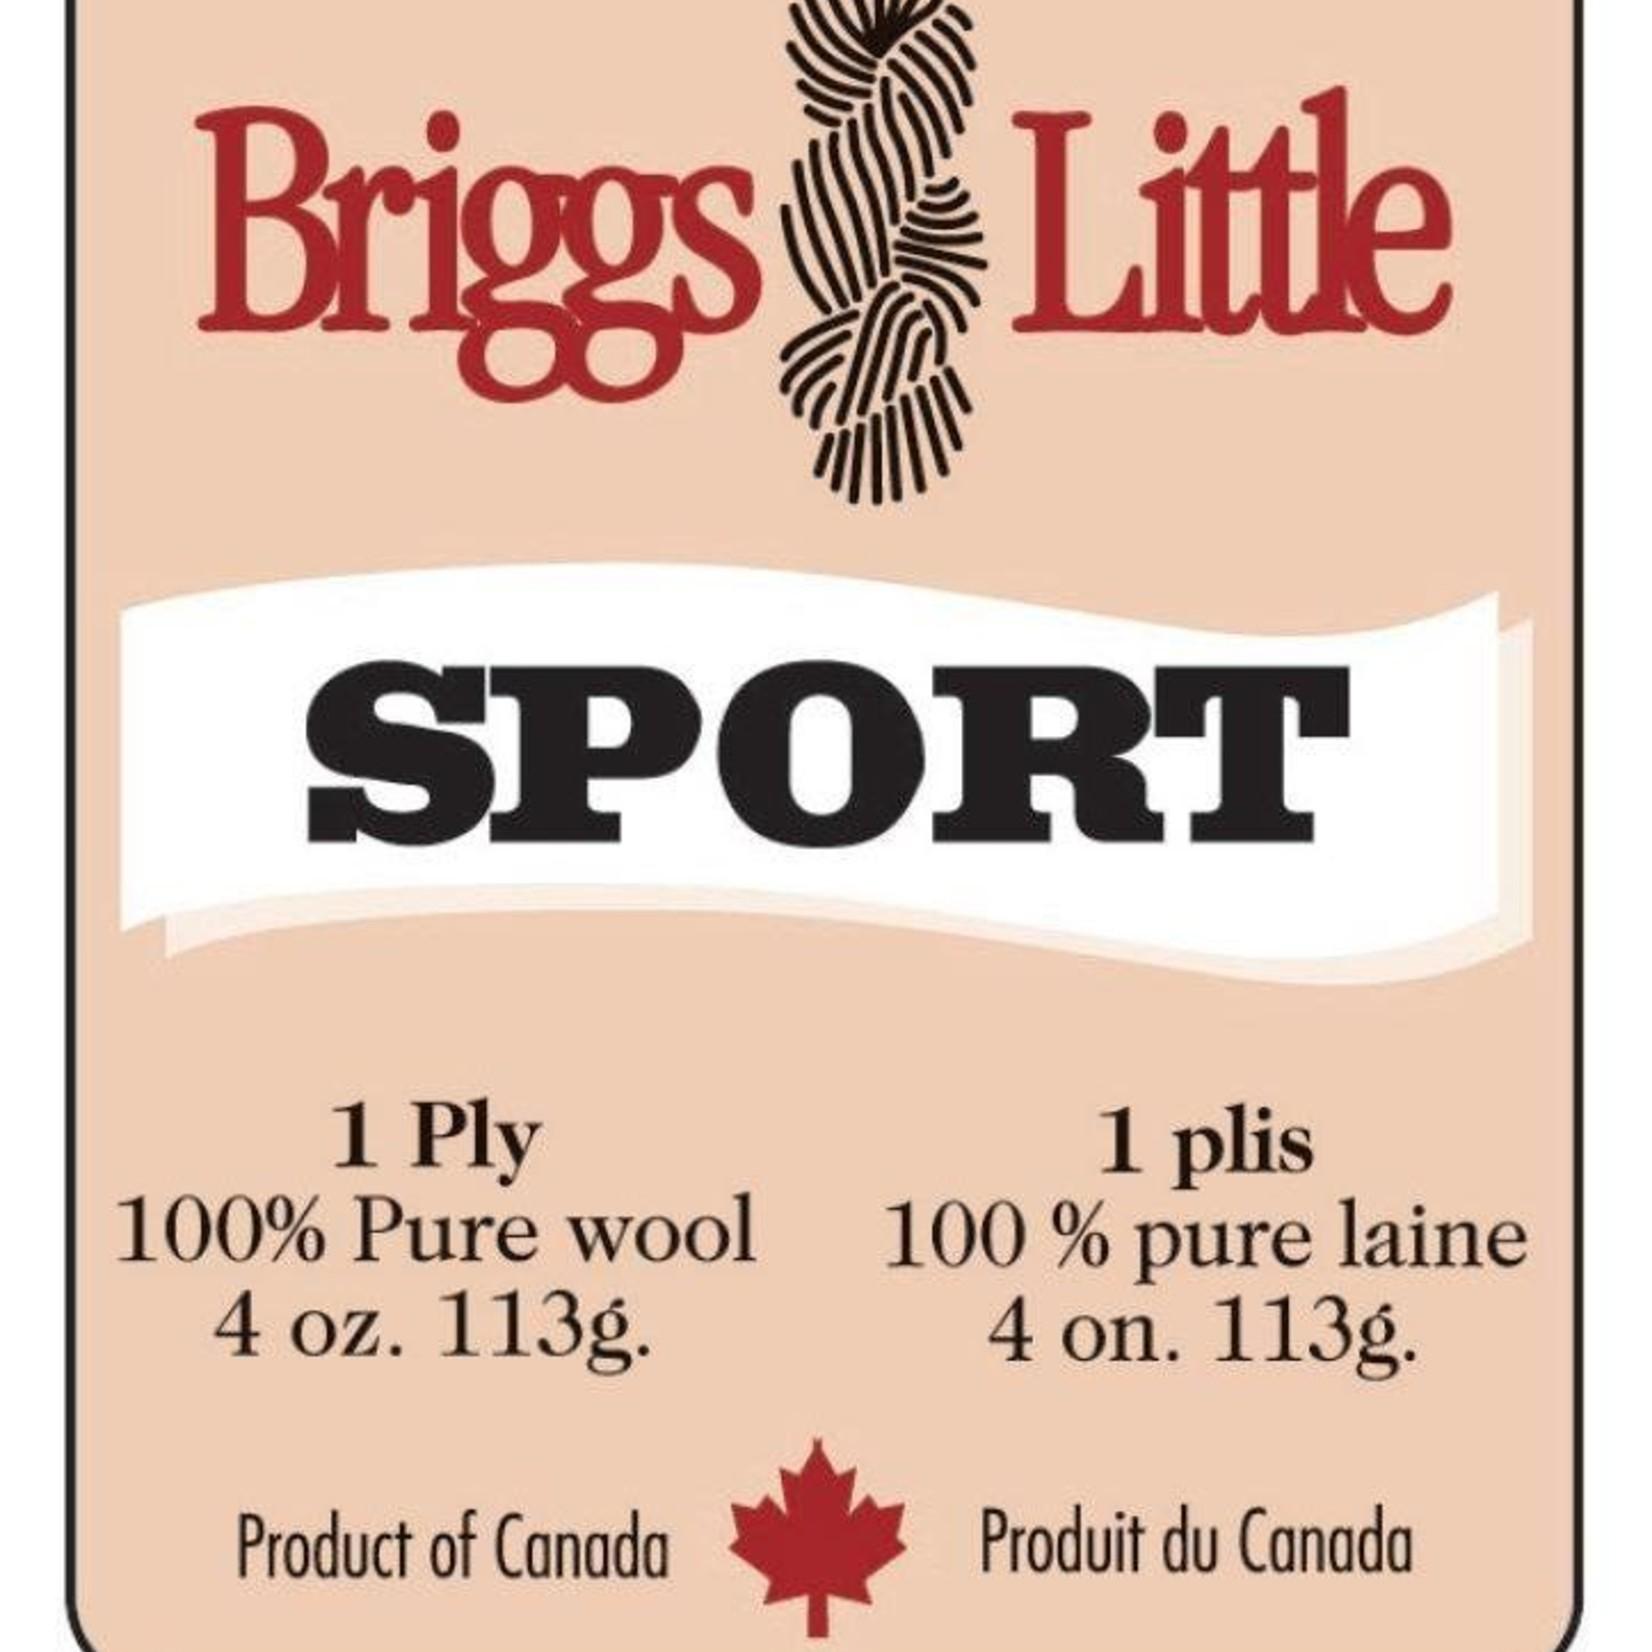 Briggs & Little Sport Yarn by Briggs & Little